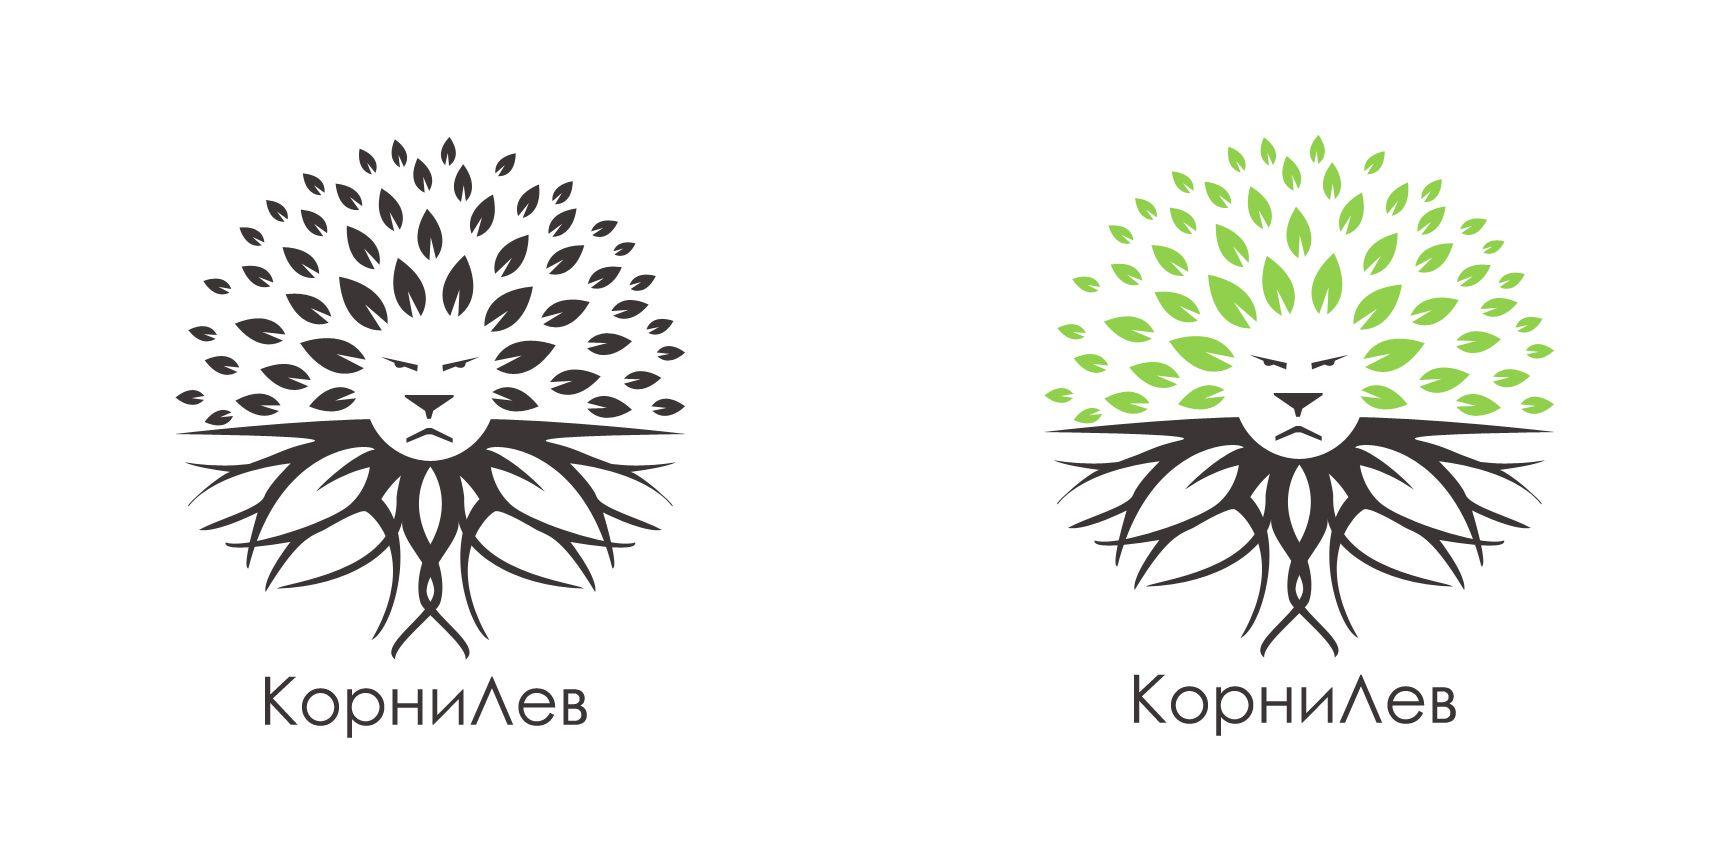 Логотип для компании КорниЛев - дизайнер Kapitane